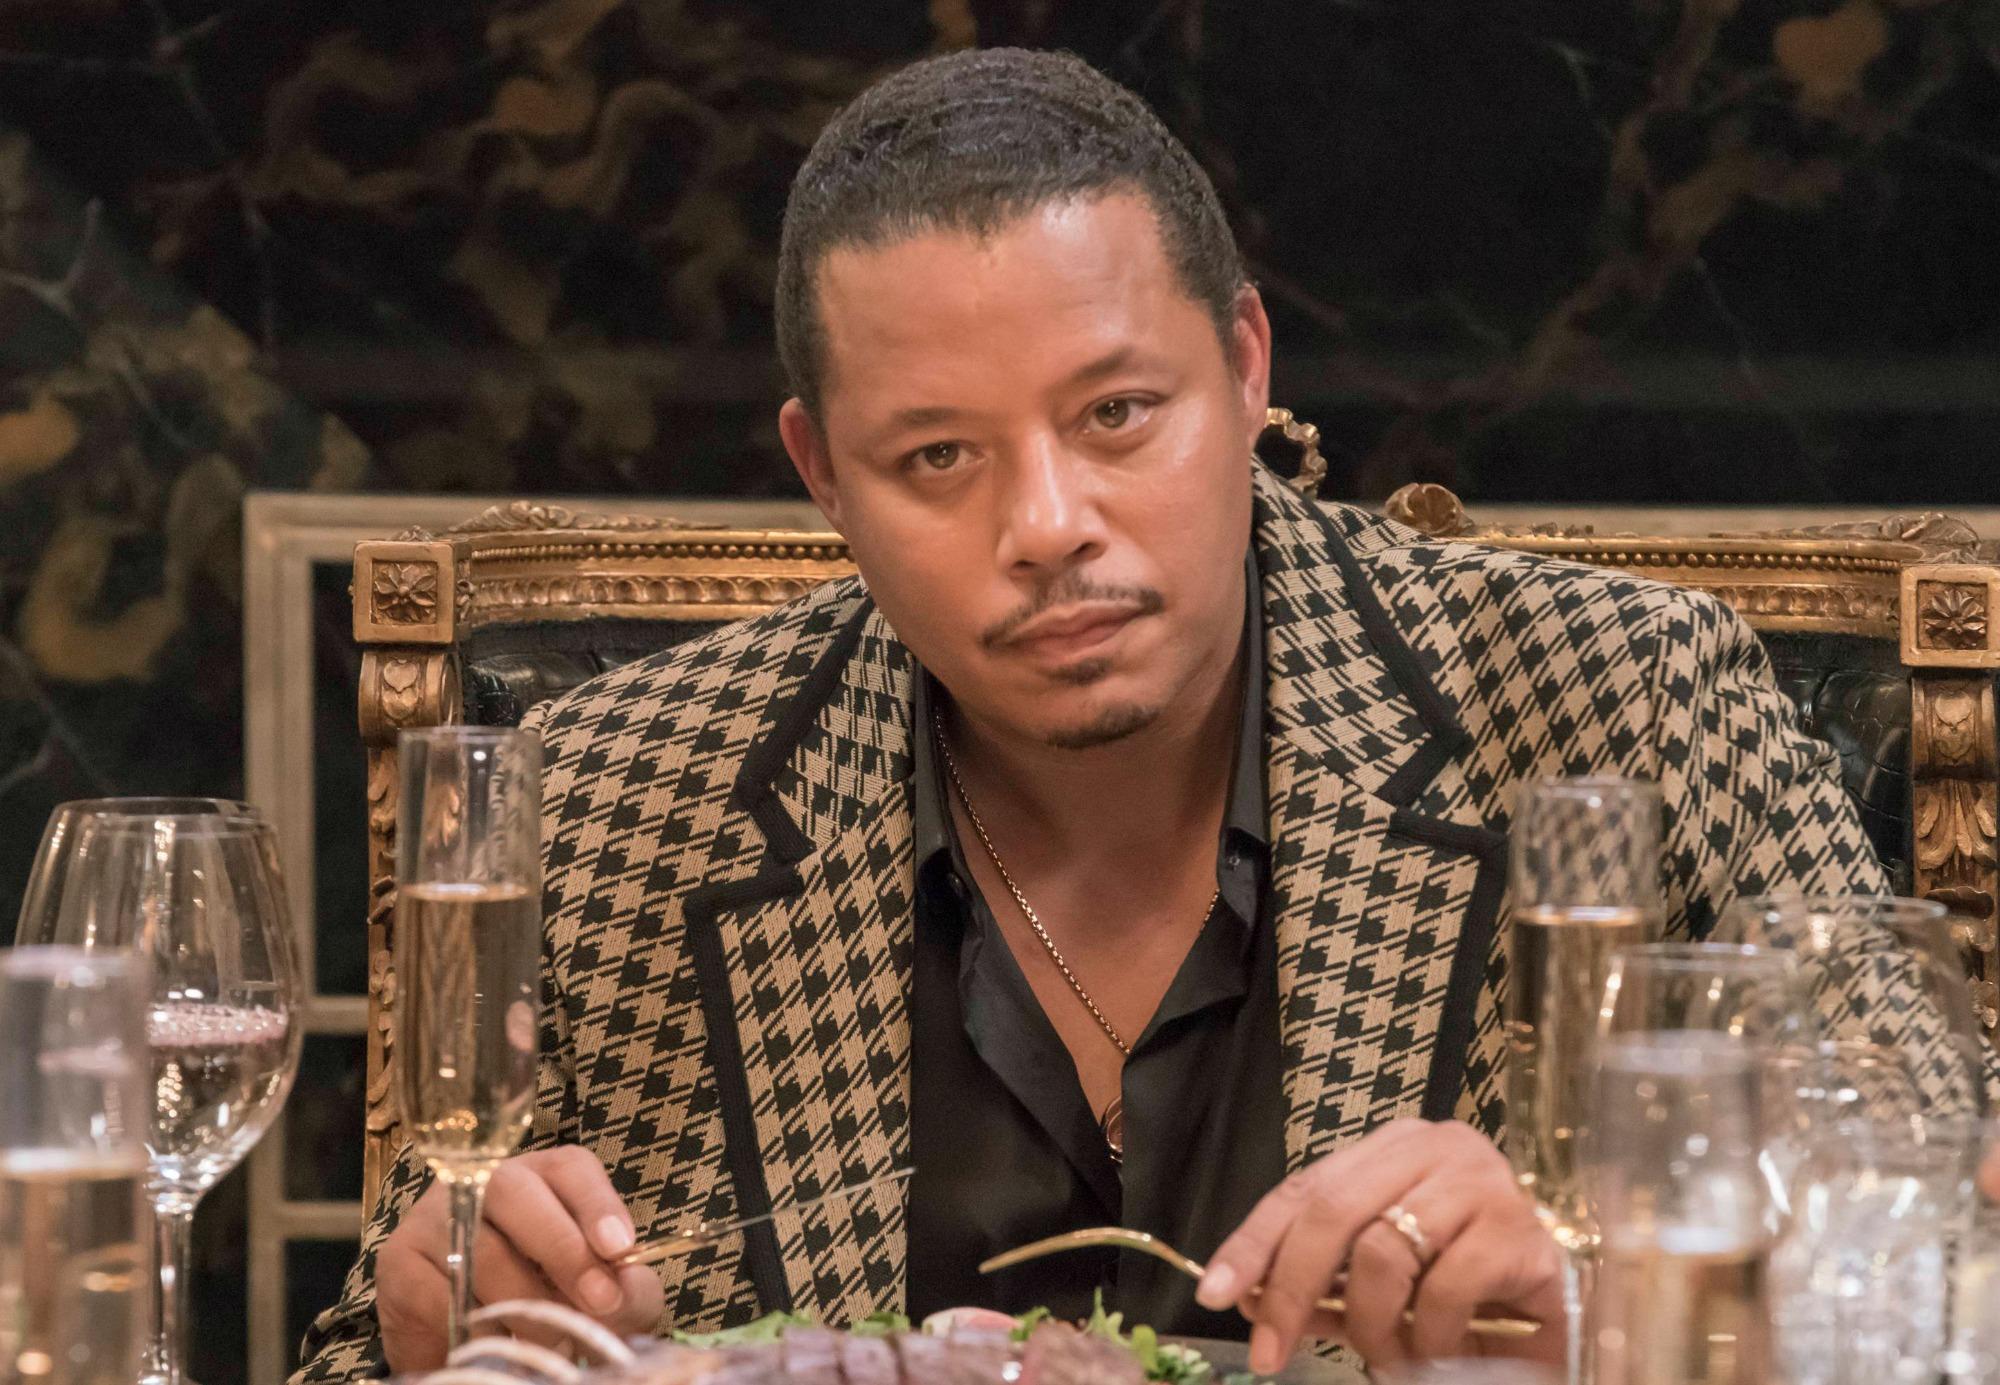 How Empire's Season 3 Premiere Handled That Big Cliffhanger